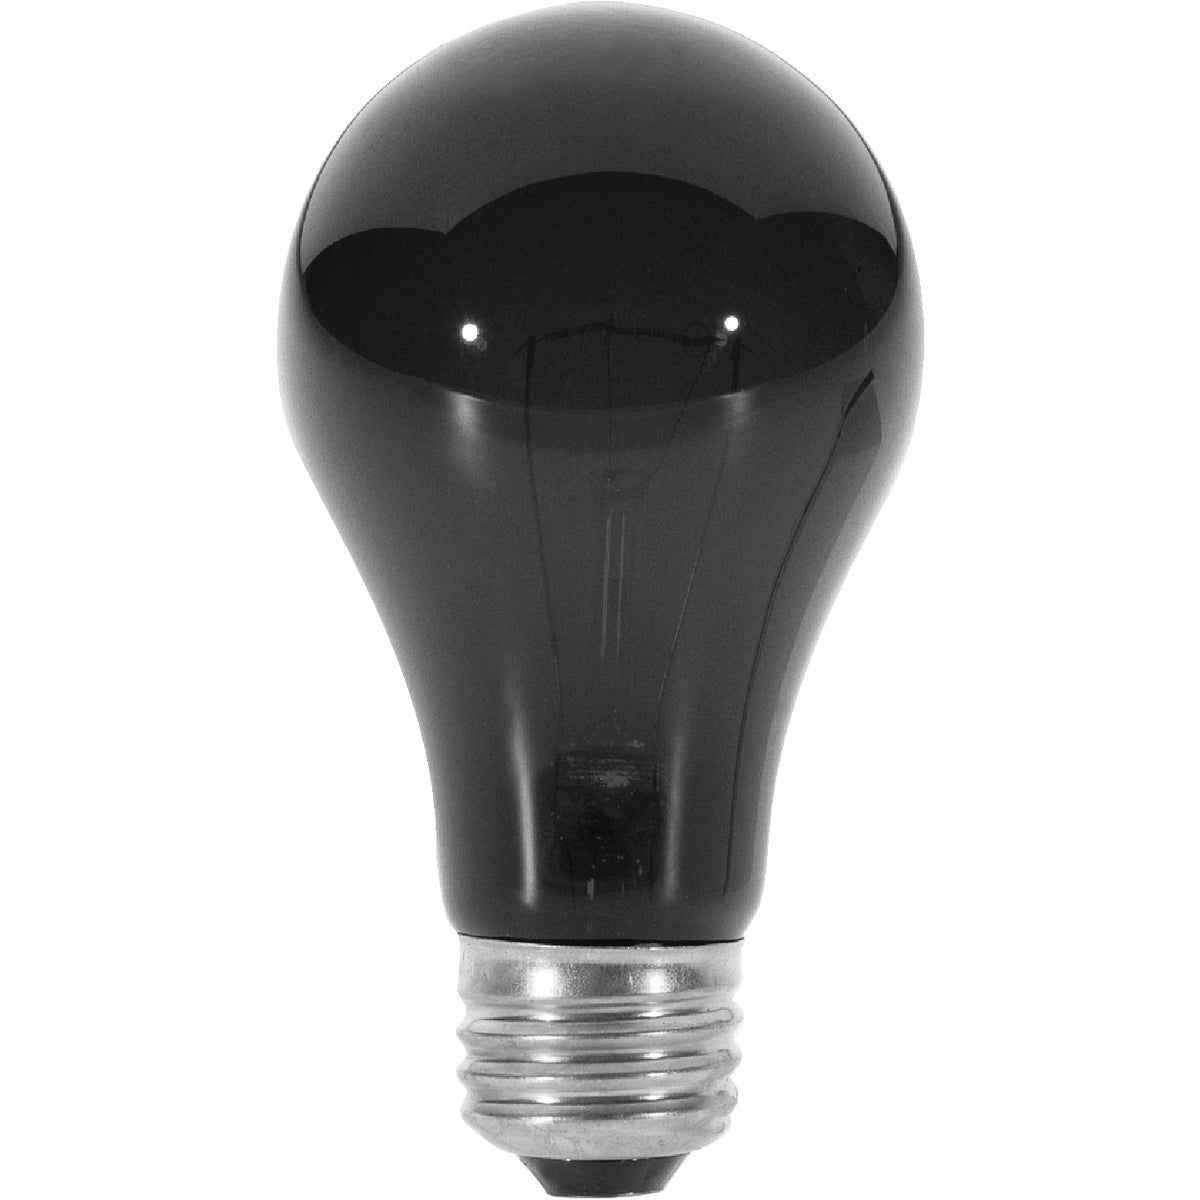 60W BLACKLIGHT BULB - 25905 by G E Lighting